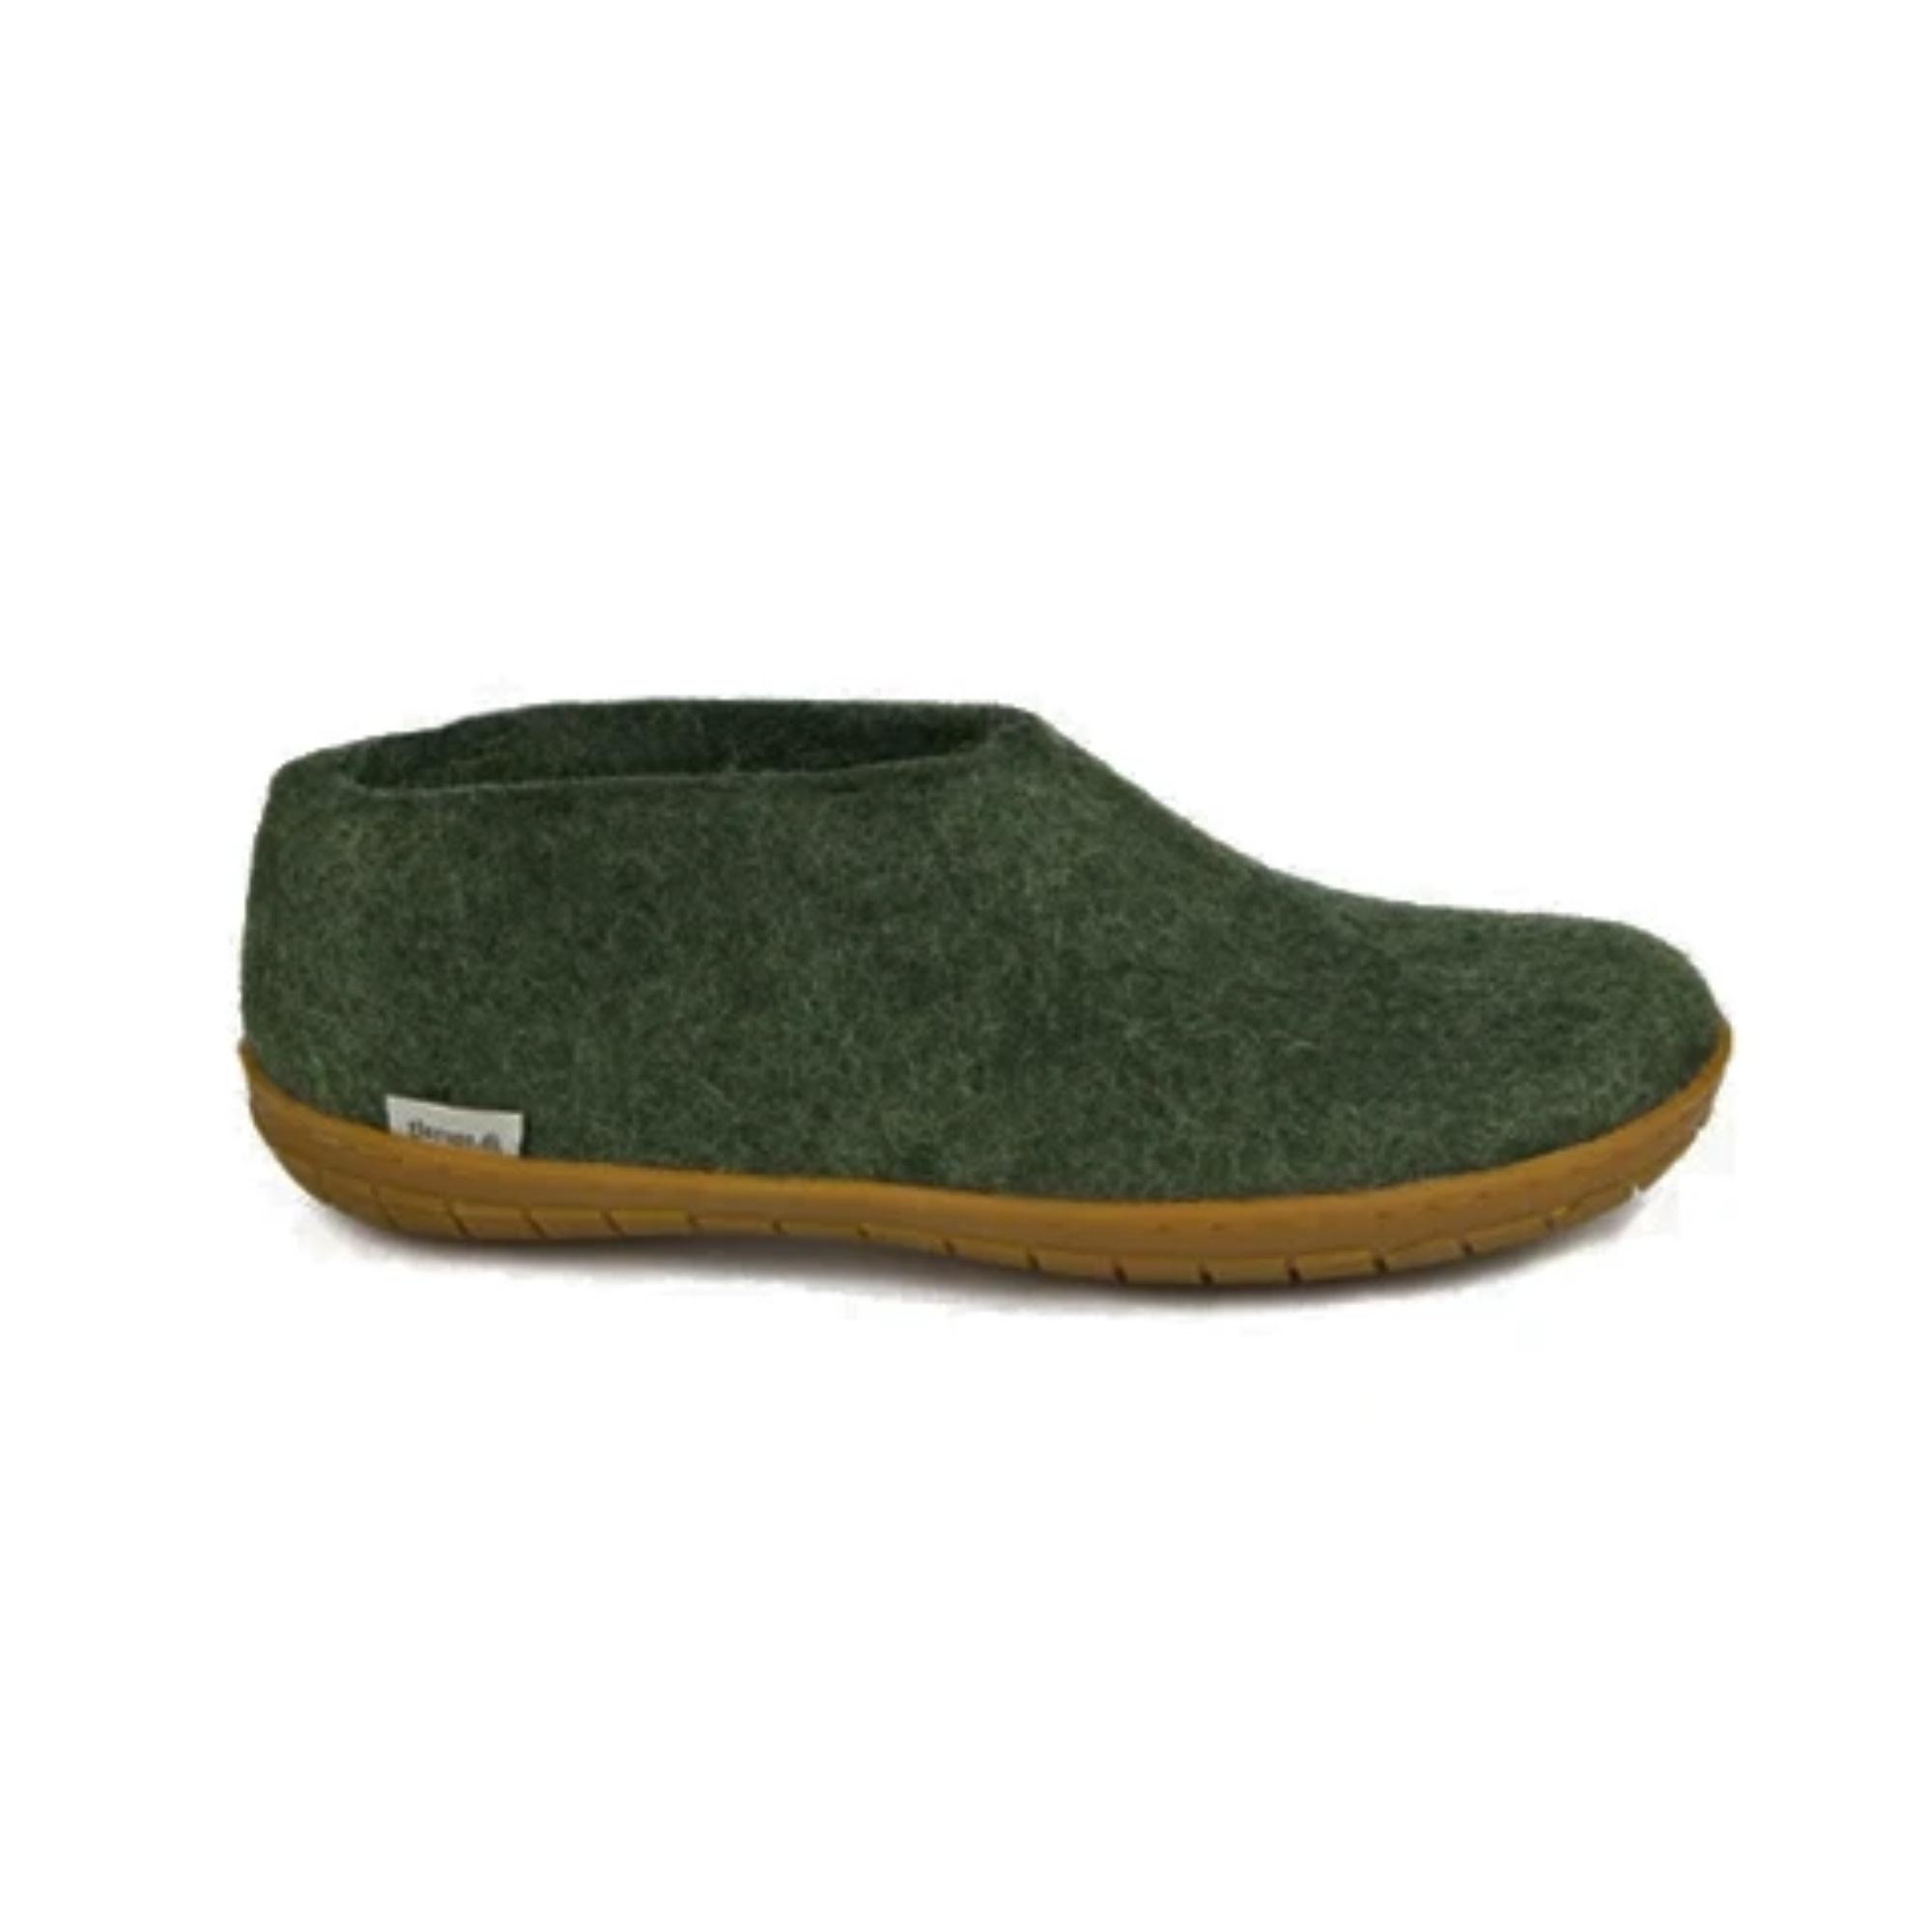 Glerups Glerups Shoe (rubber sole) - Forest